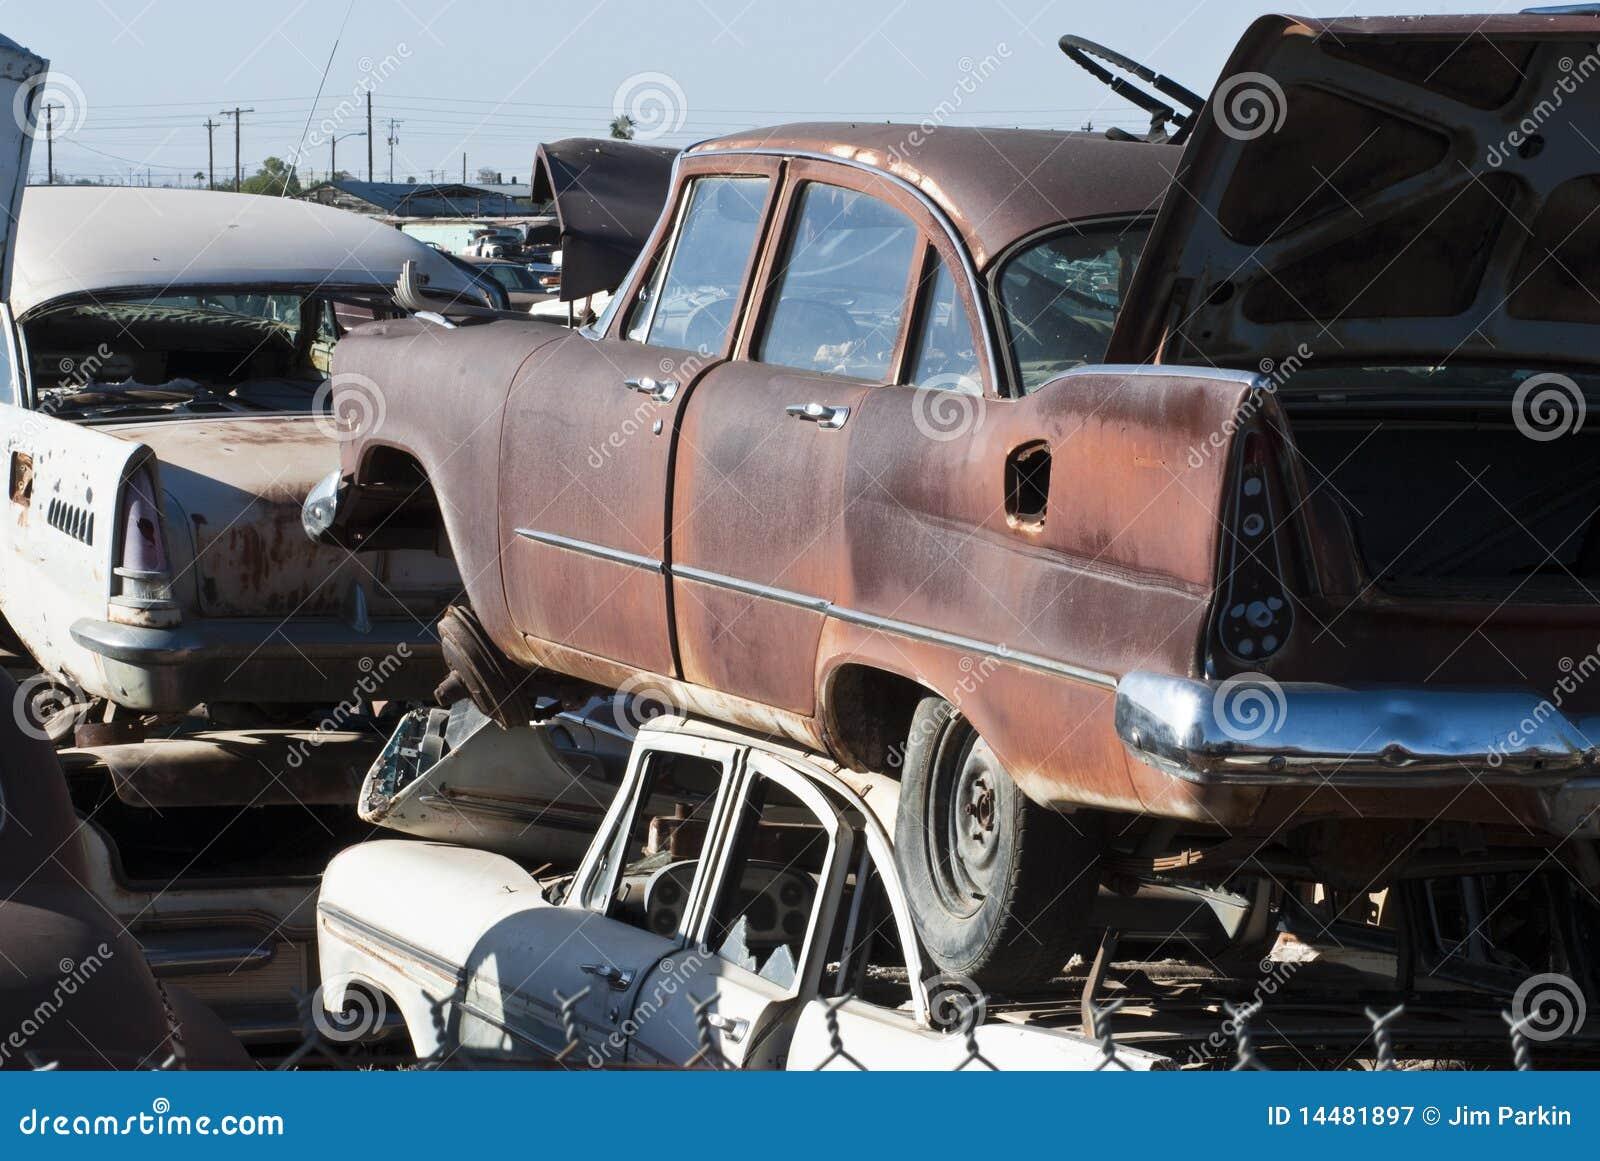 Auto Salvage Yard stock image. Image of salvage, scavenge - 14481897